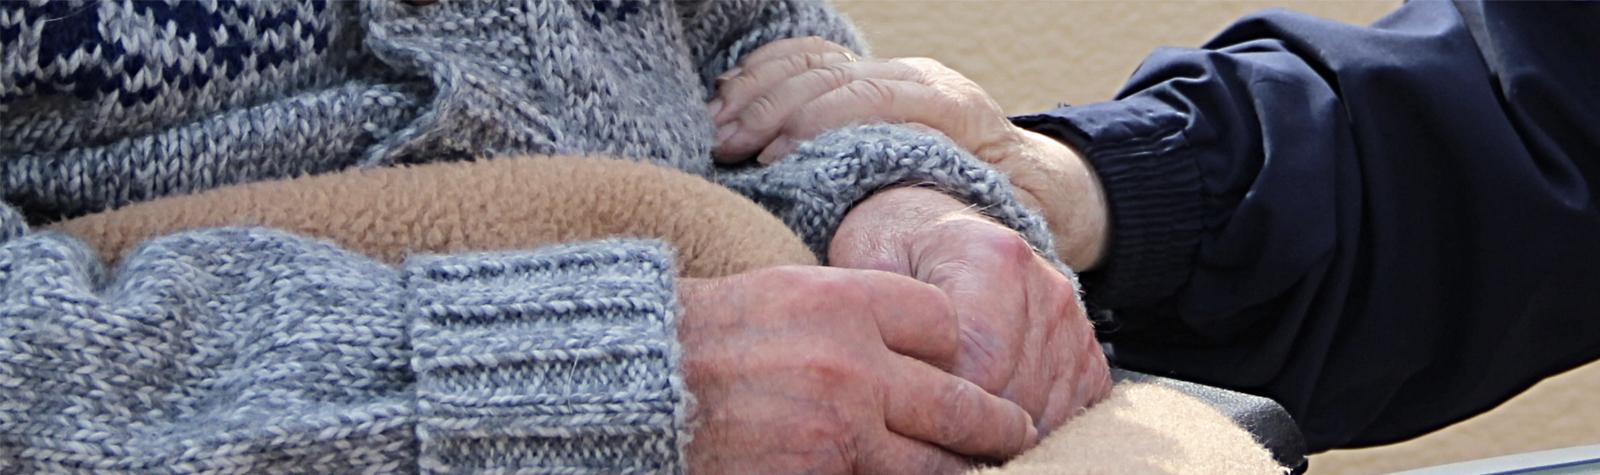 Avamere Transitional Care & Rehabilitation – Case Story